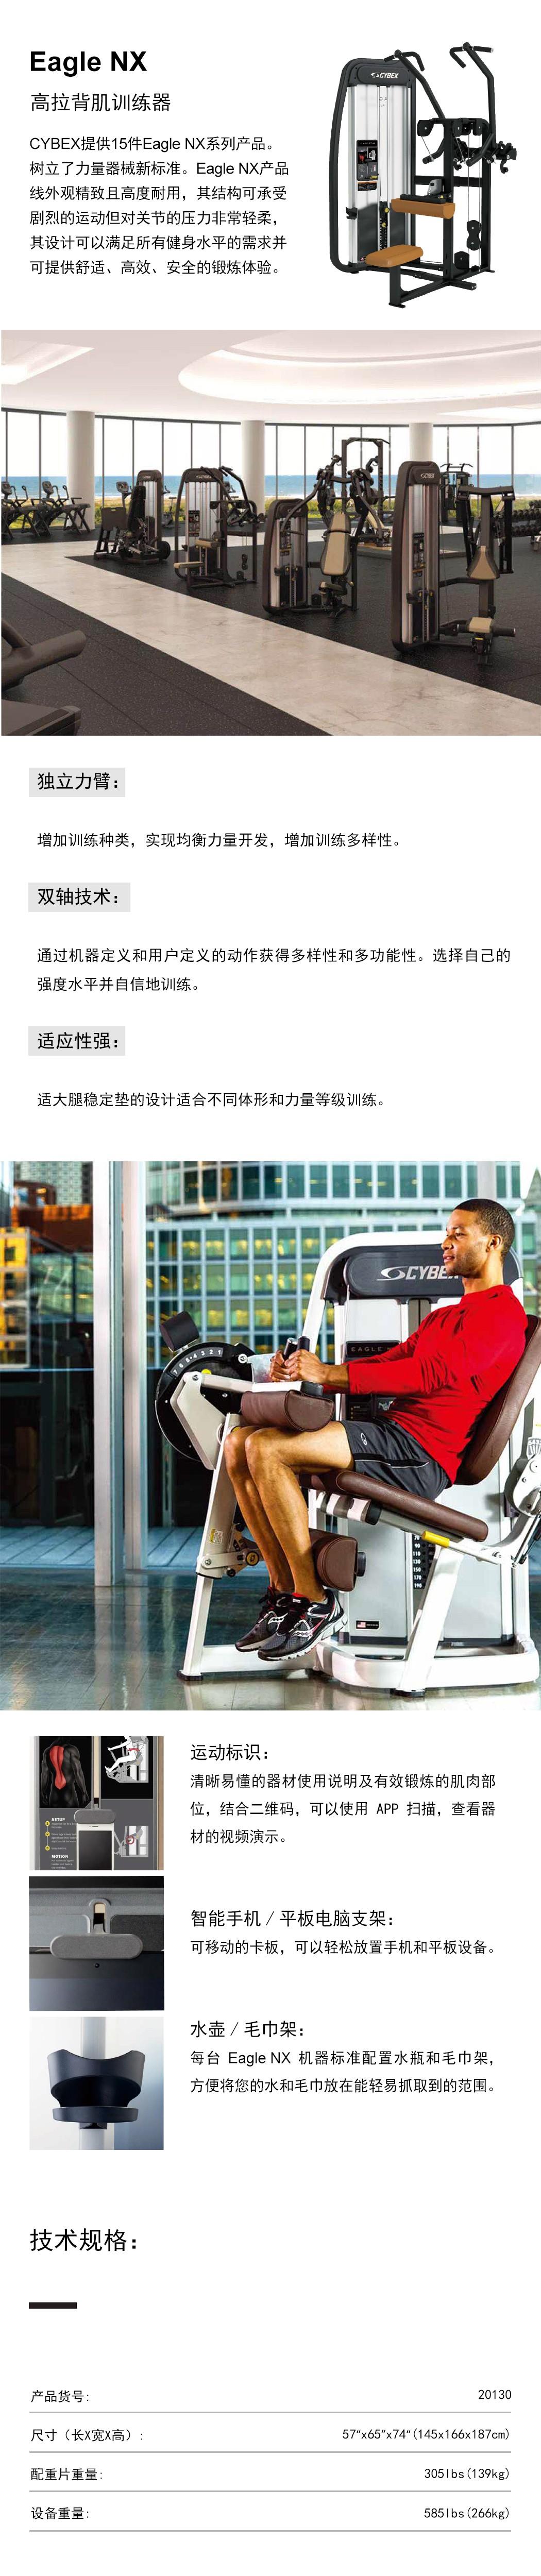 cybex-高拉背肌训练器.jpg